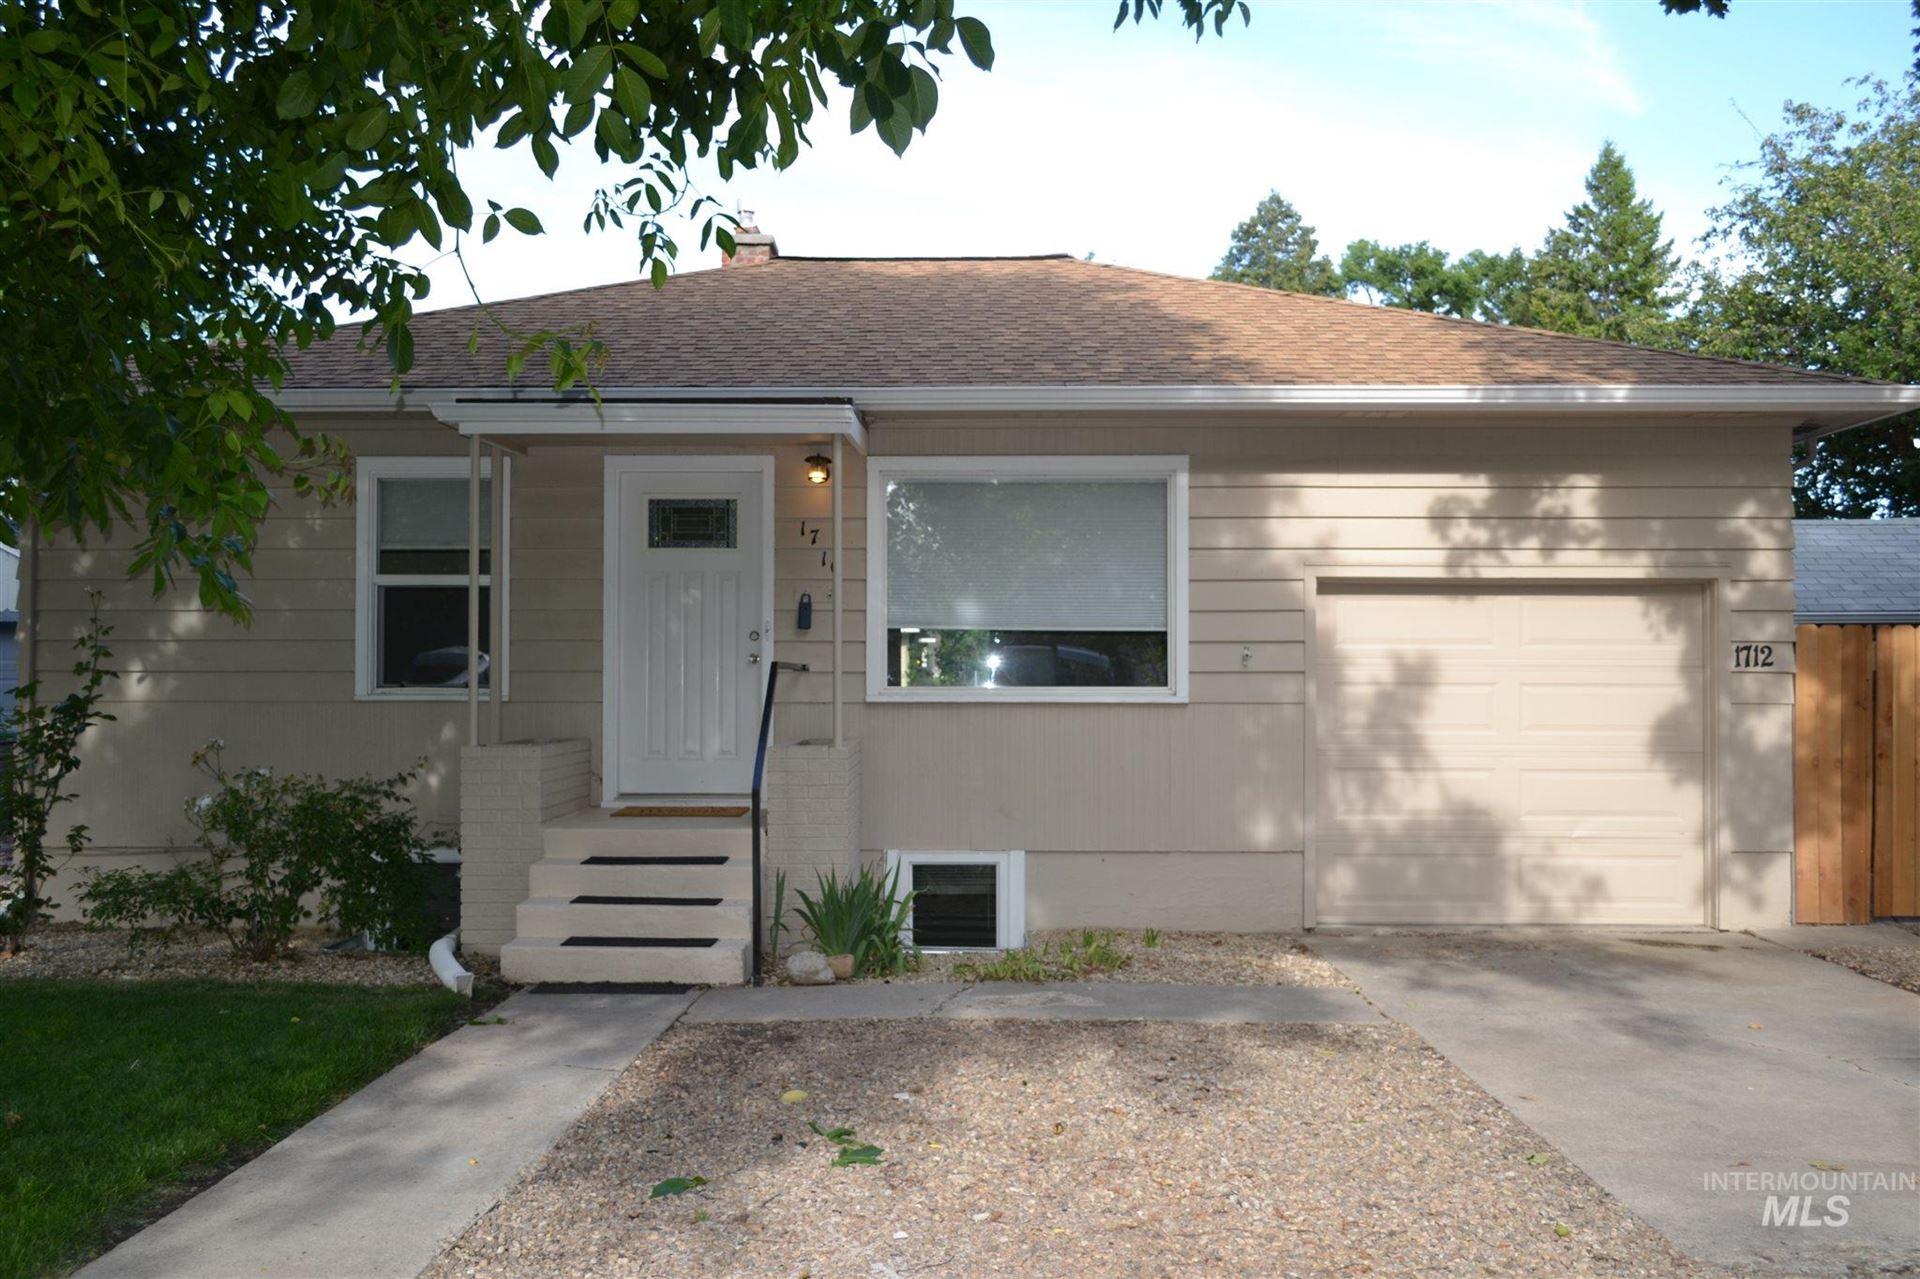 1710 S Pacific St, Boise, ID 83705 - MLS#: 98766037